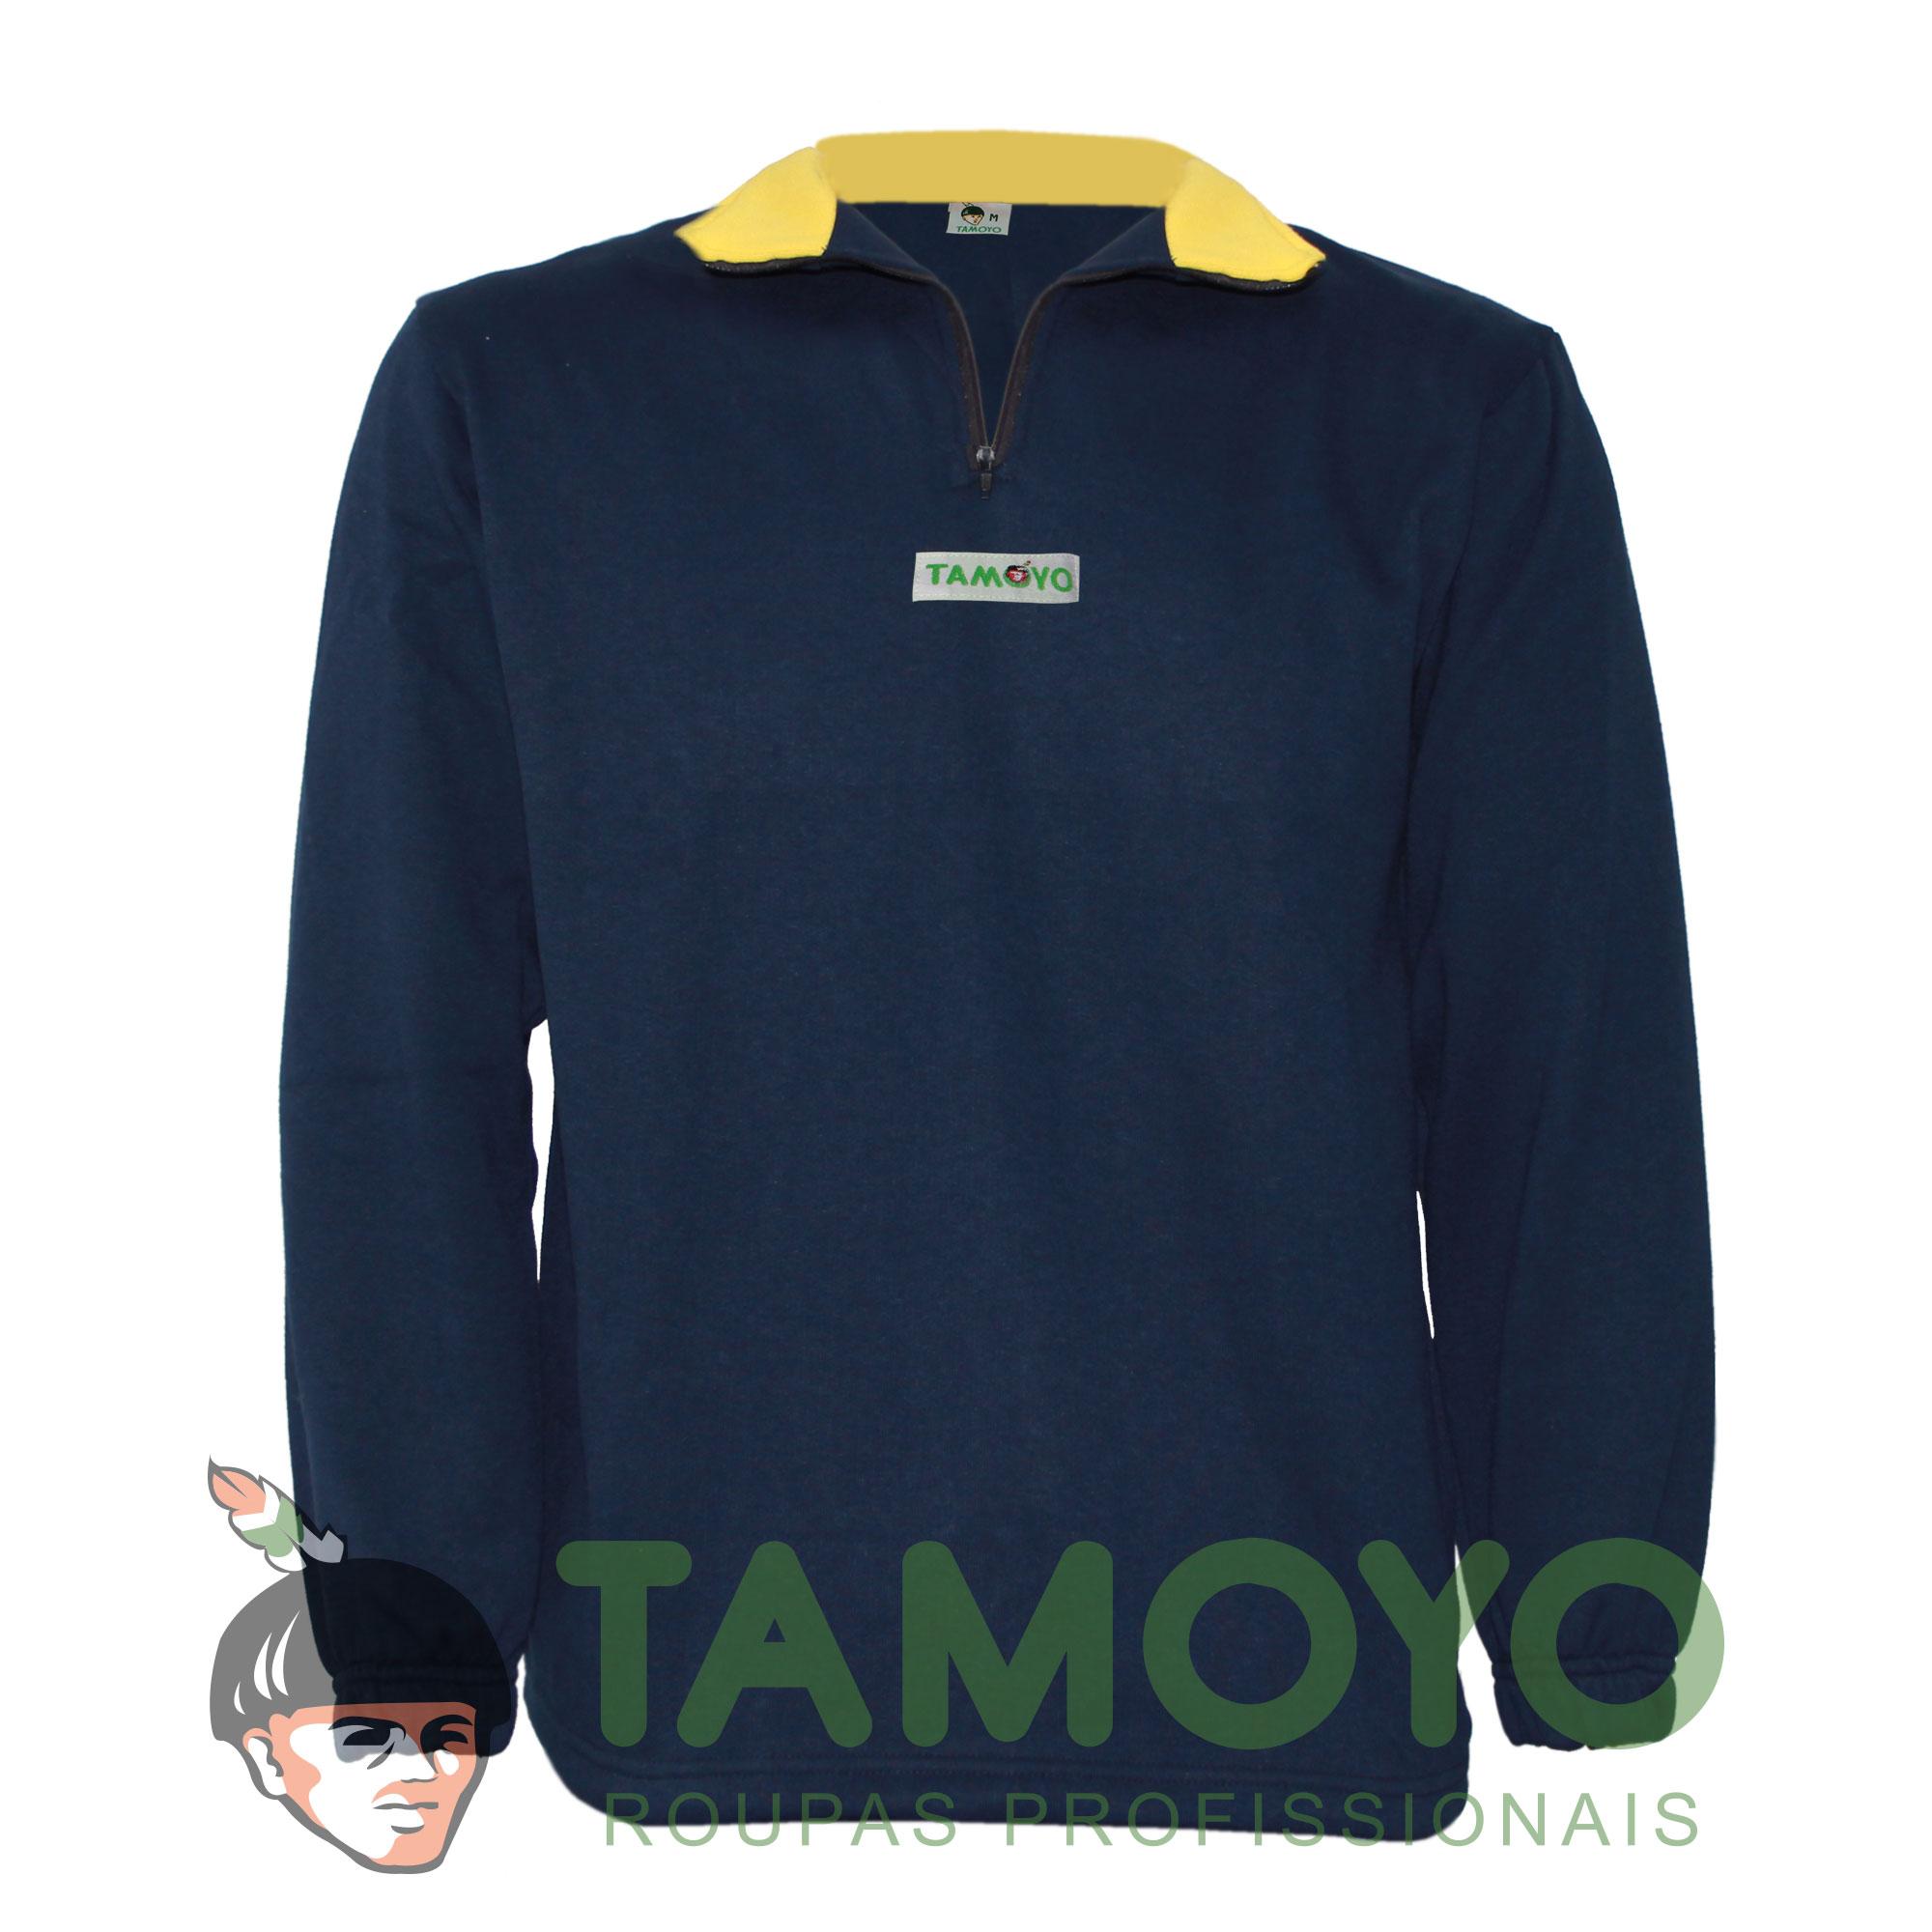 rede-postos-combustivel-roupas-tamoyo-blusao-moletom-2